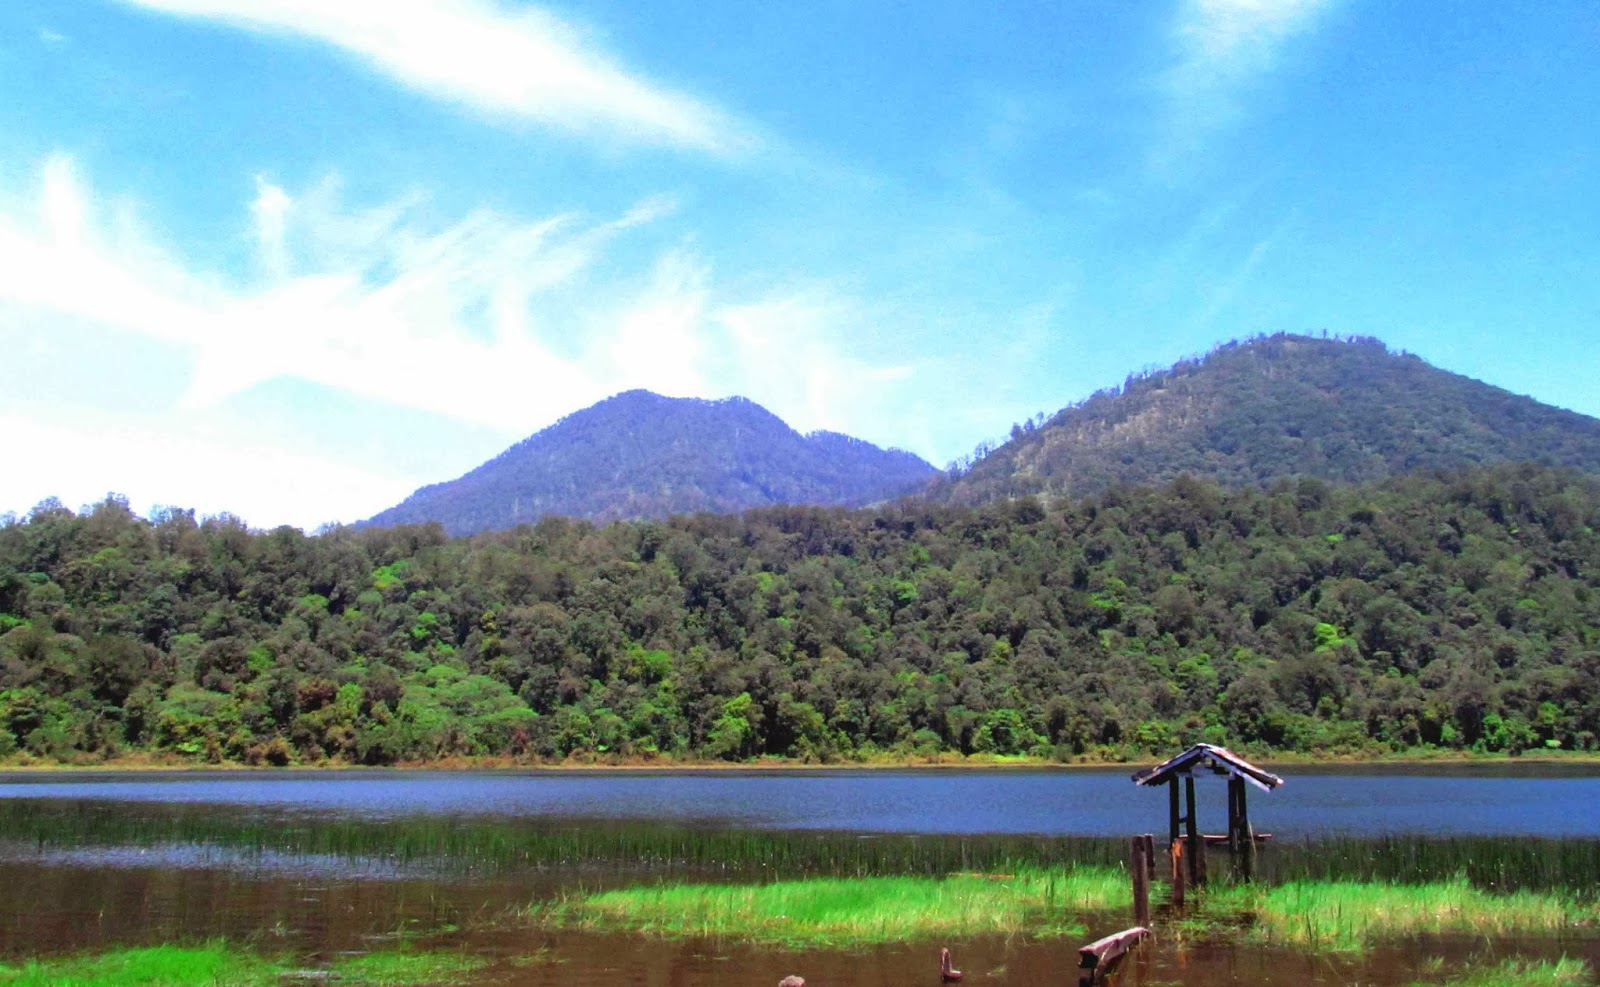 Danau Taman Hidup Wisata Indah Di Kaki Gunung Argopuro Jawa Timur Jawa Timur